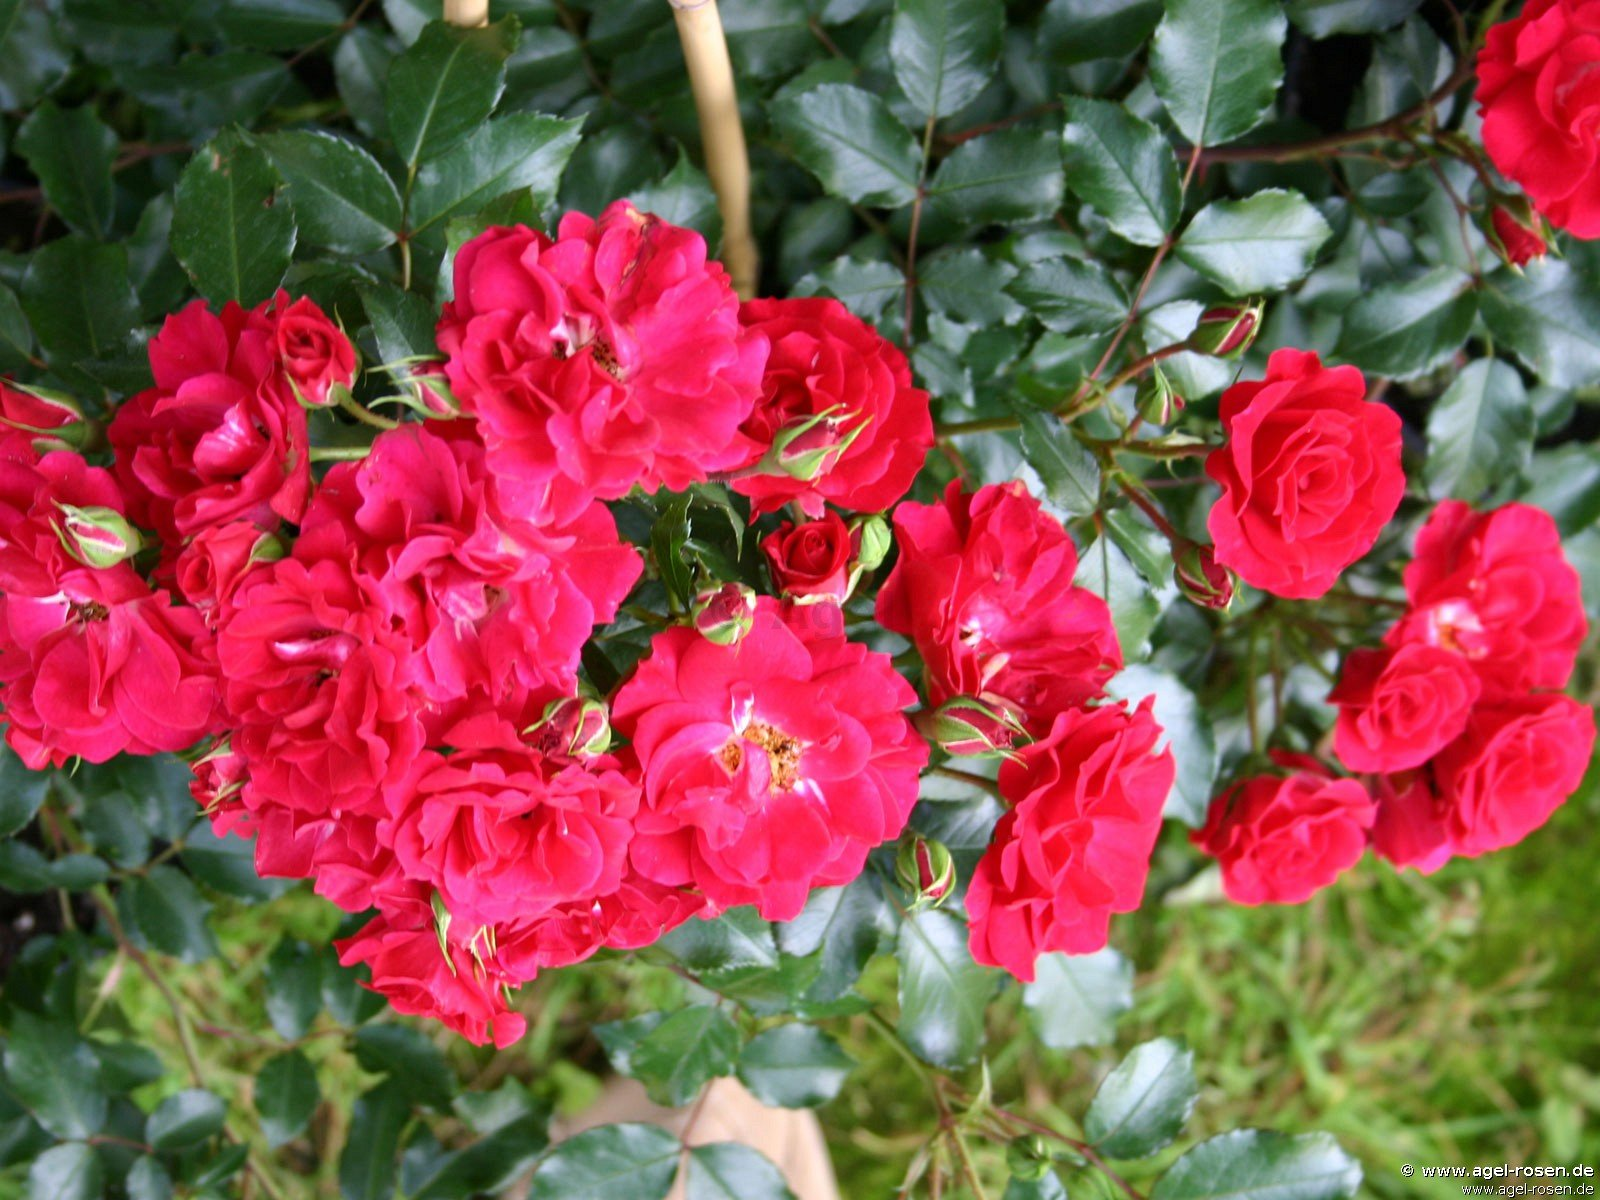 buy rose rotilia online at agel rosen miniature tree roses 40cm 5l pot container roses. Black Bedroom Furniture Sets. Home Design Ideas